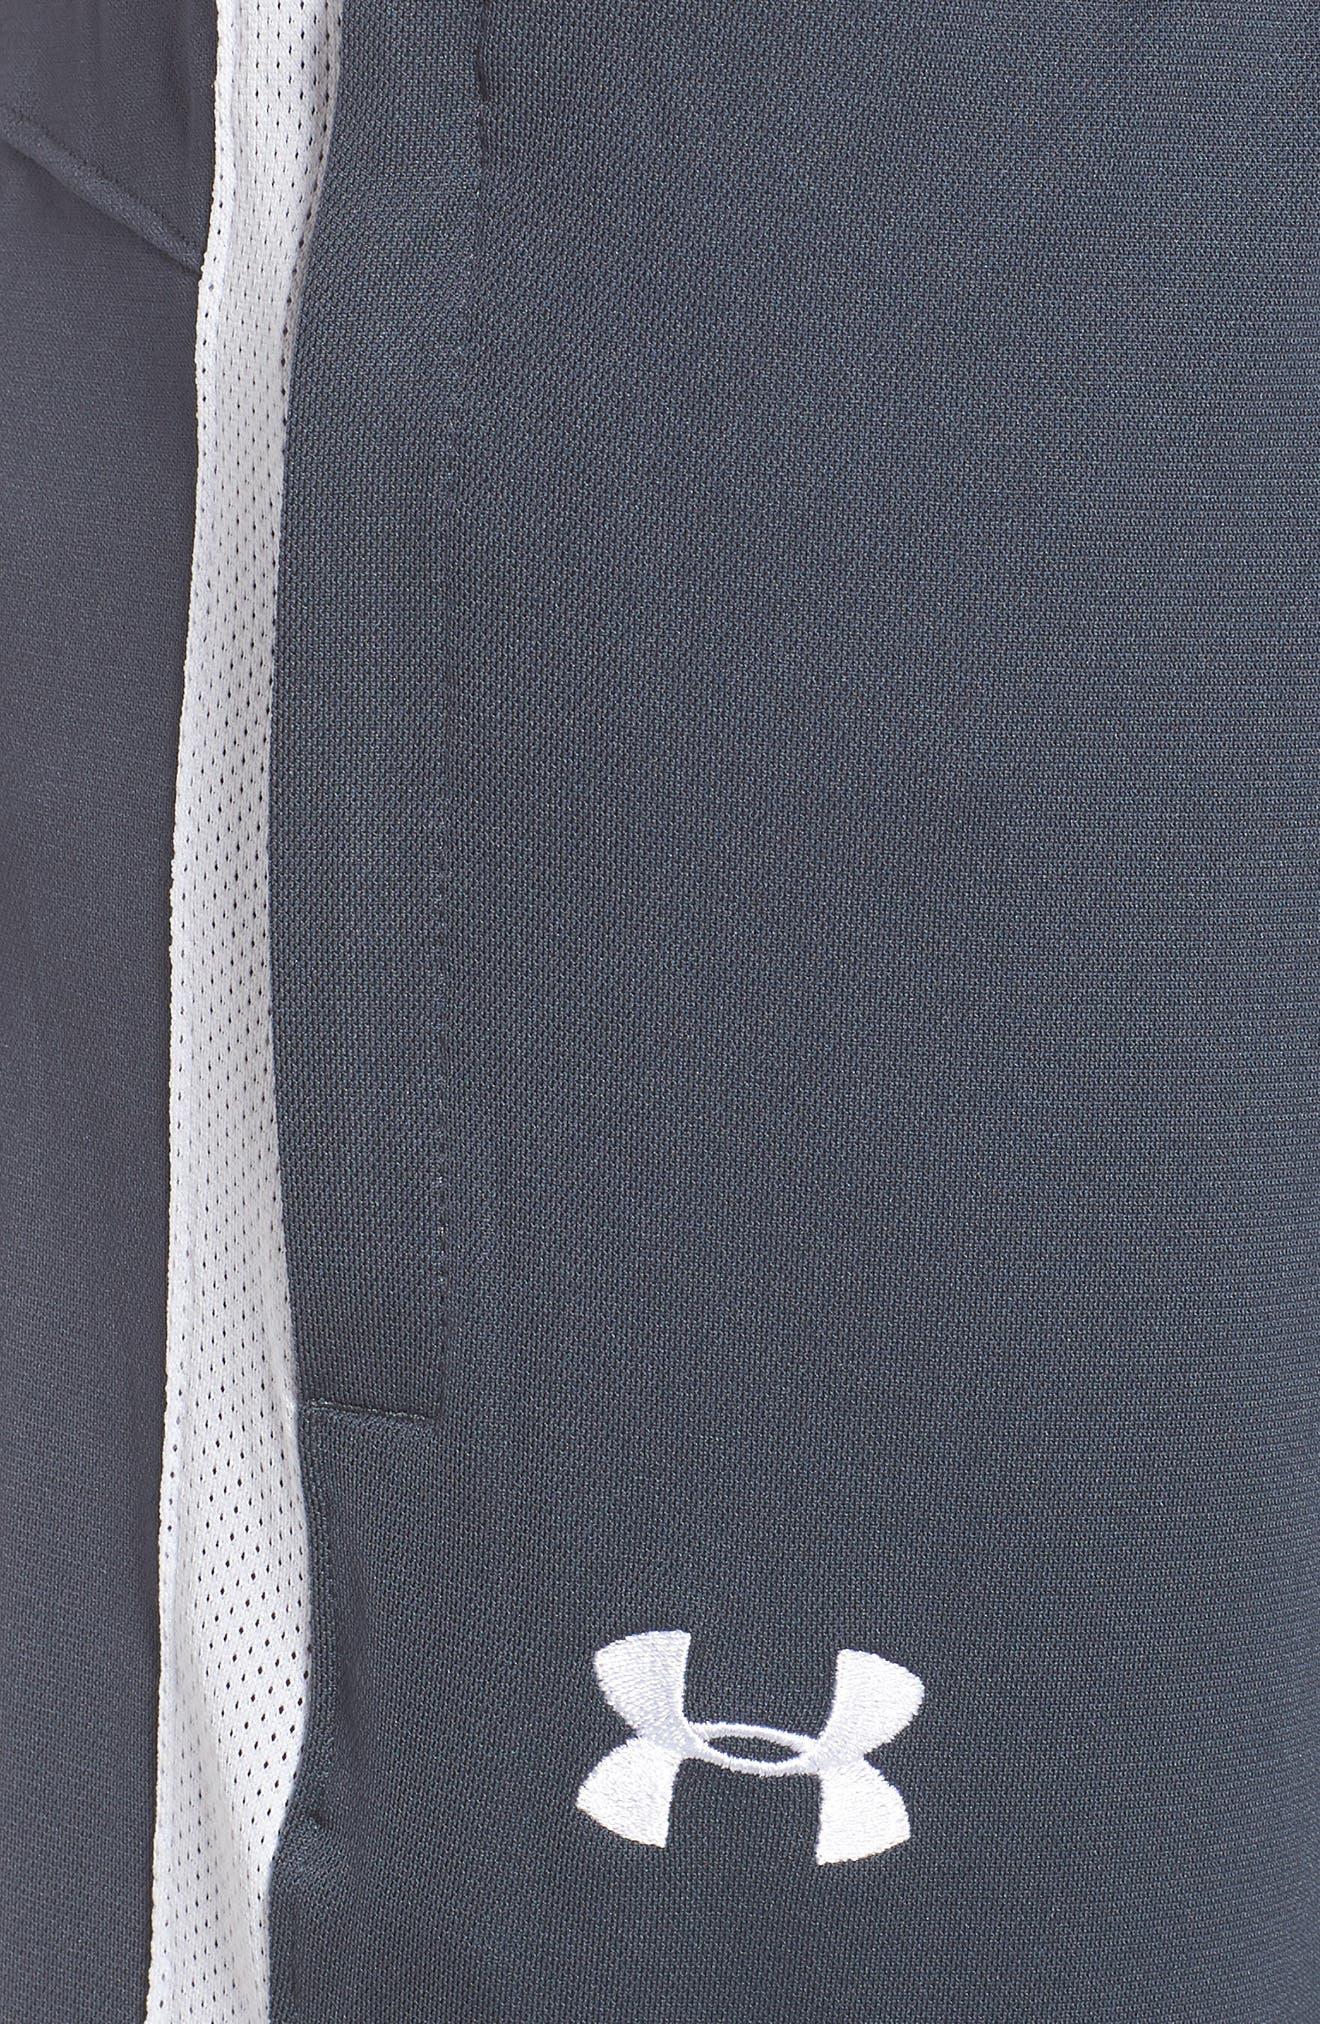 Sportstyle Slim Piqué Track Pants,                             Alternate thumbnail 4, color,                             STEALTH GRAY / / WHITE